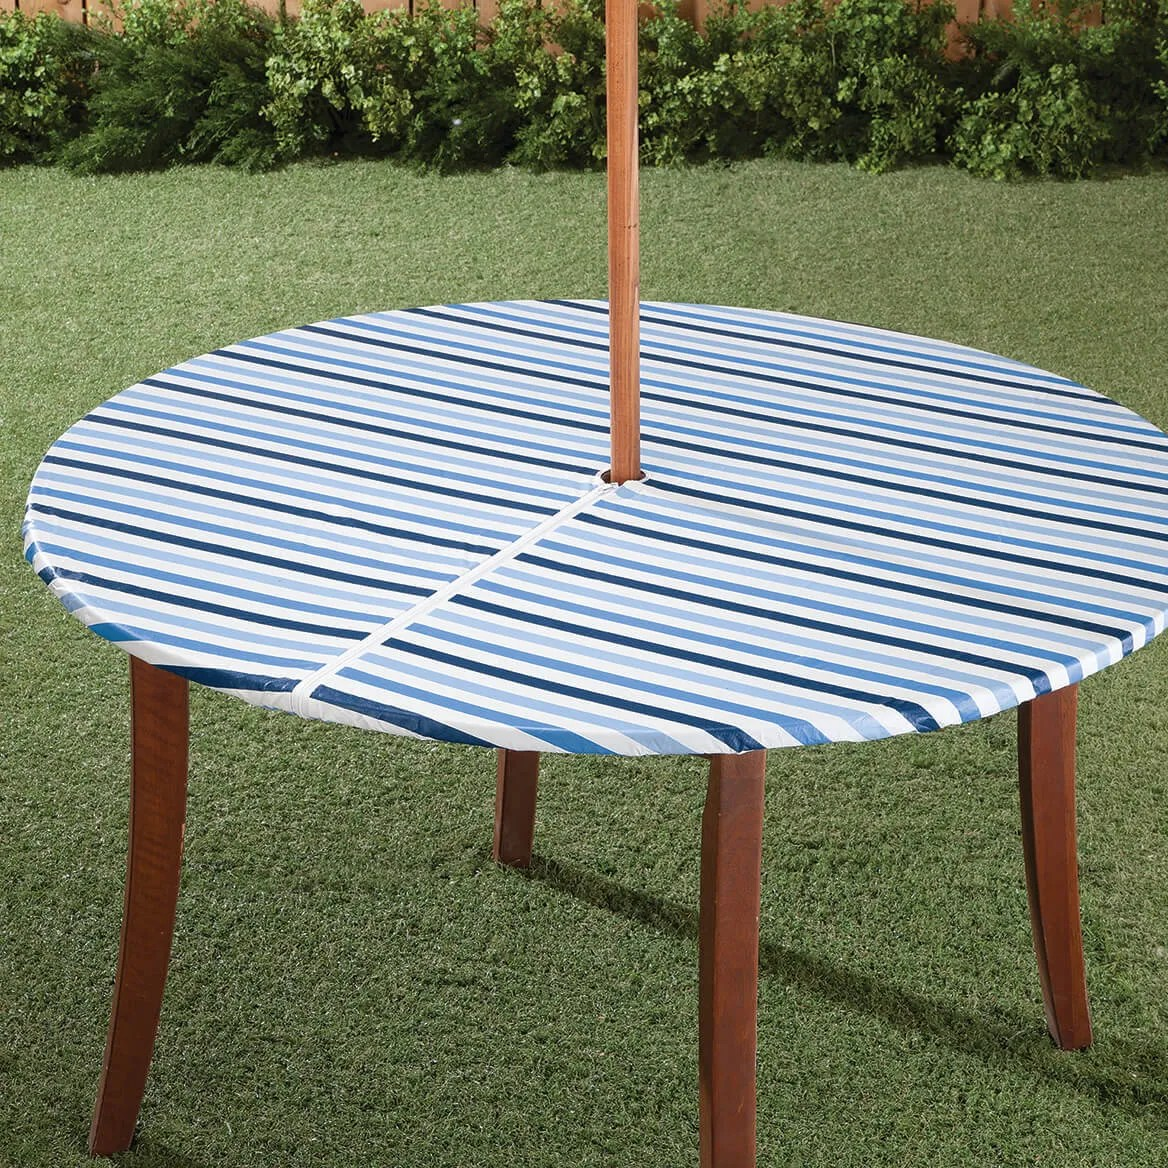 elasticized table covers snug fit